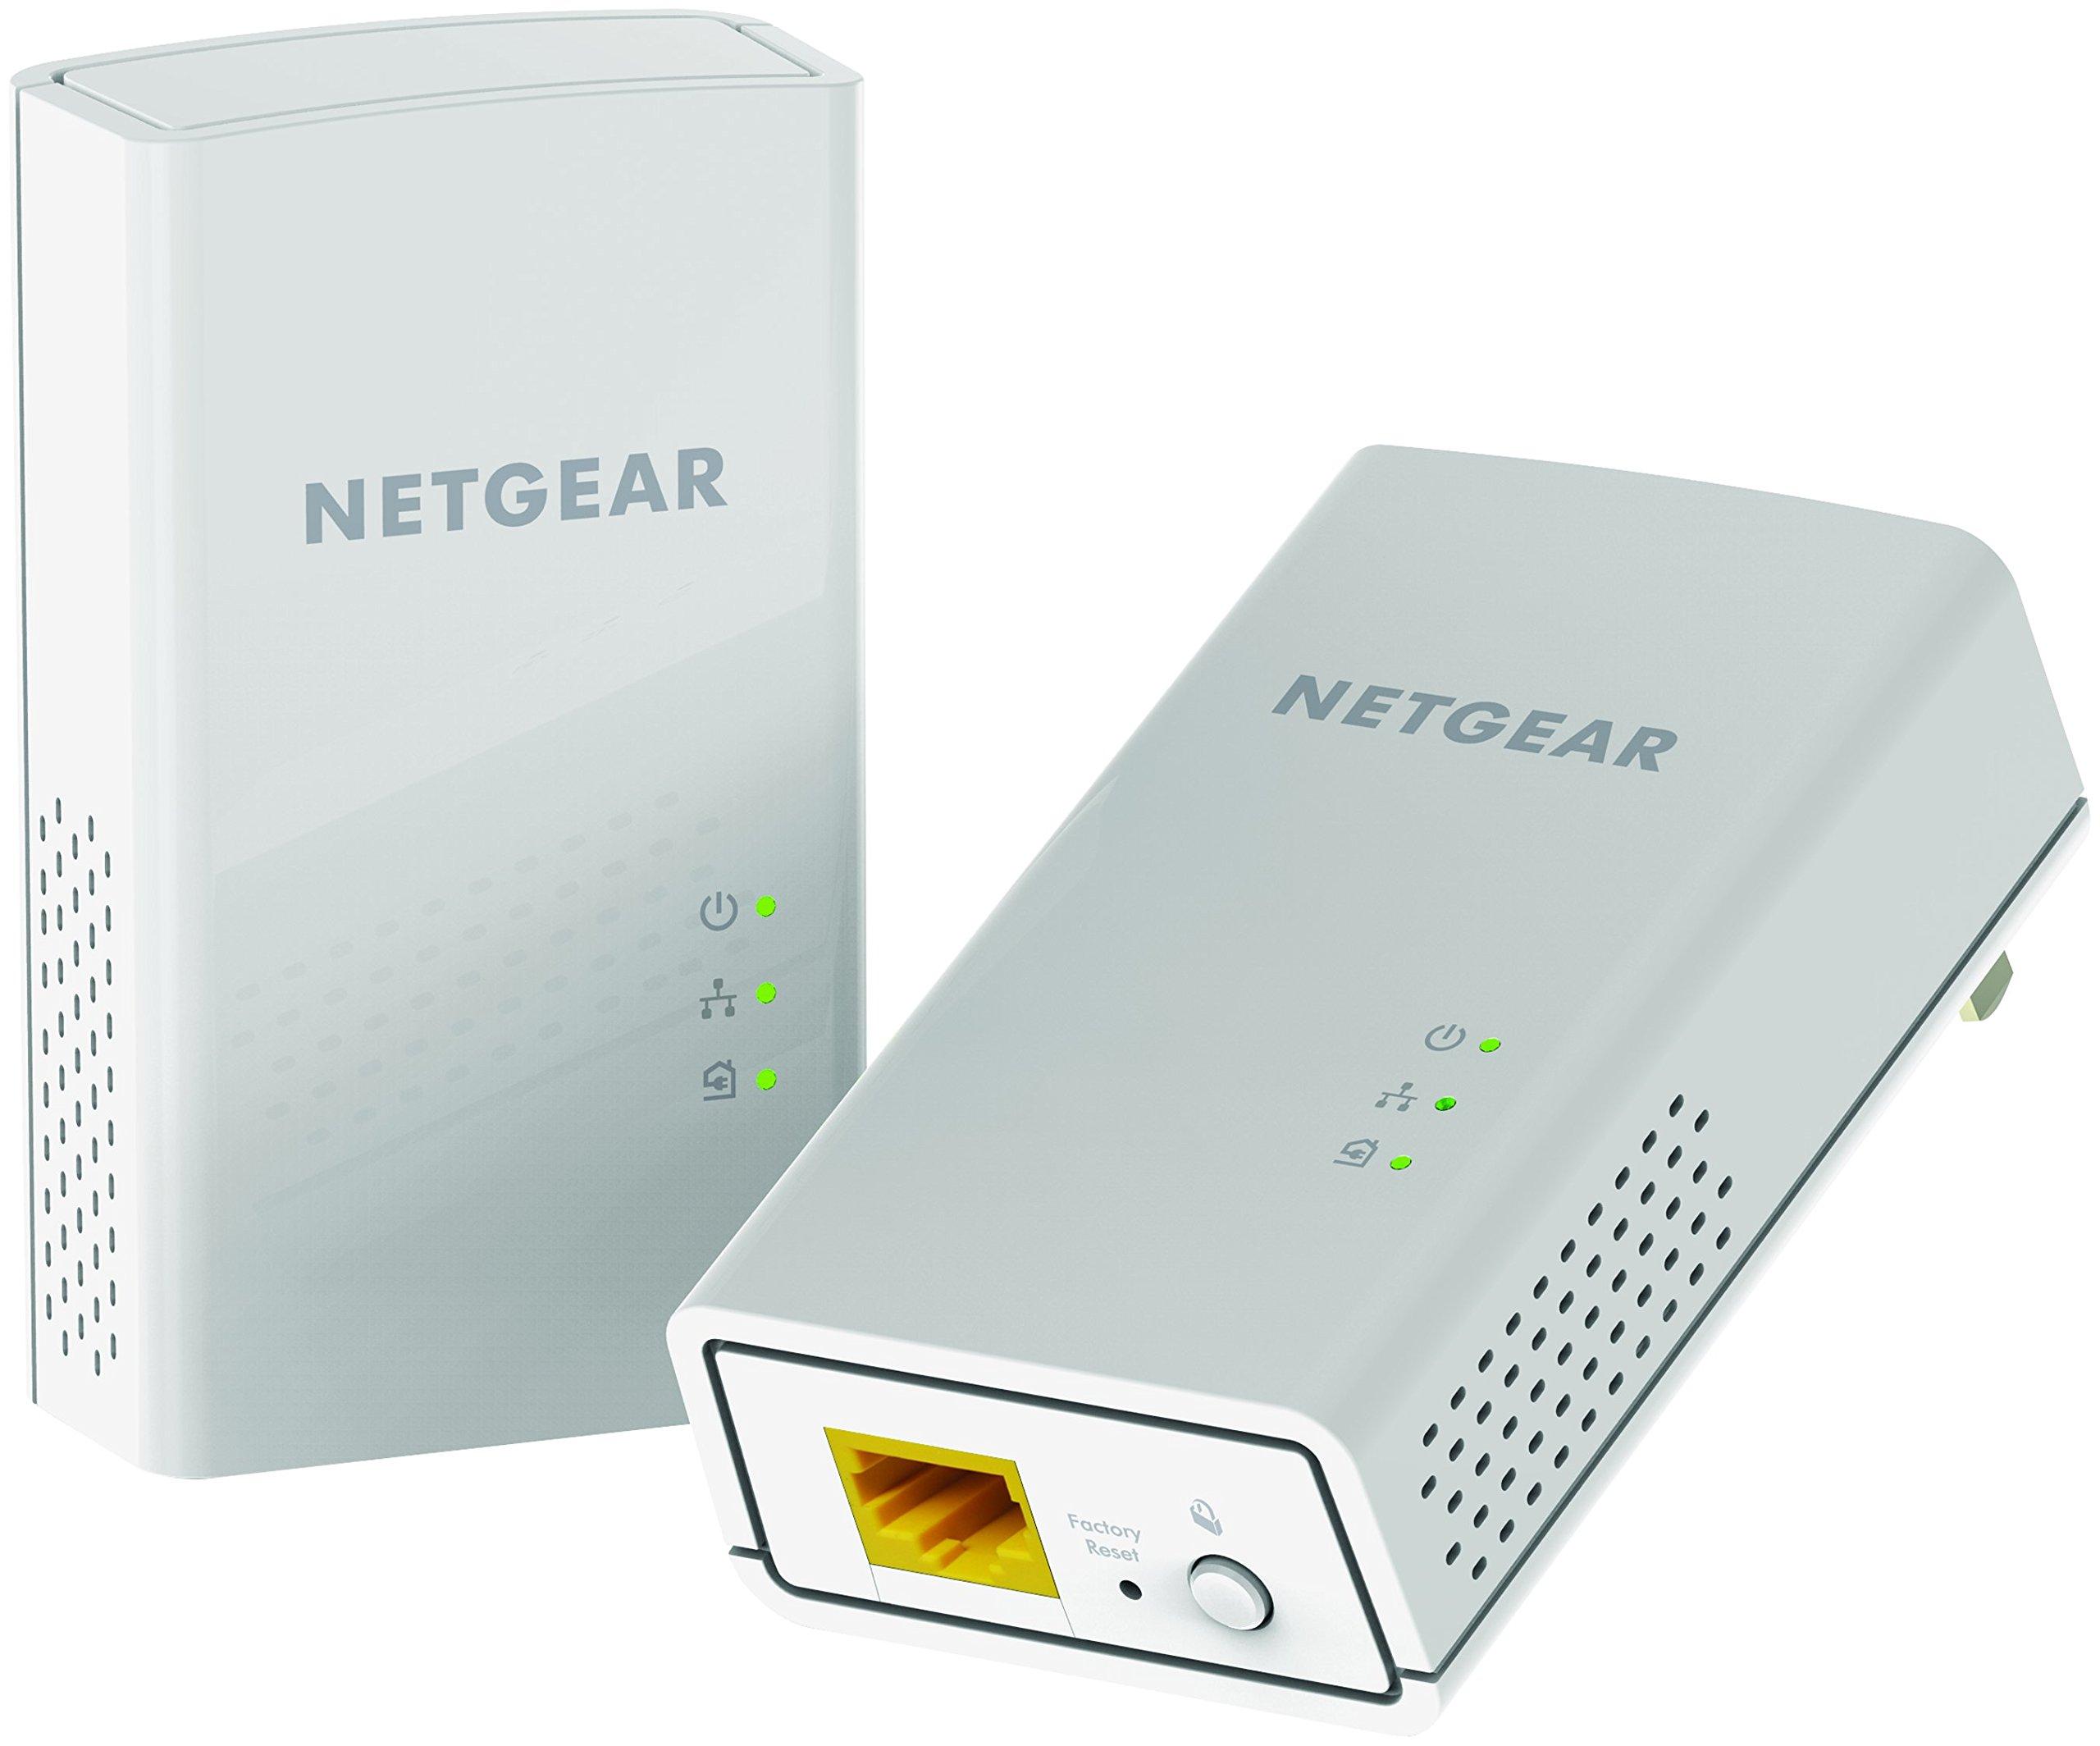 NETGEAR PowerLINE 1200 Mbps, 1 Gigabit Port (PL1200-100PAS) by NETGEAR